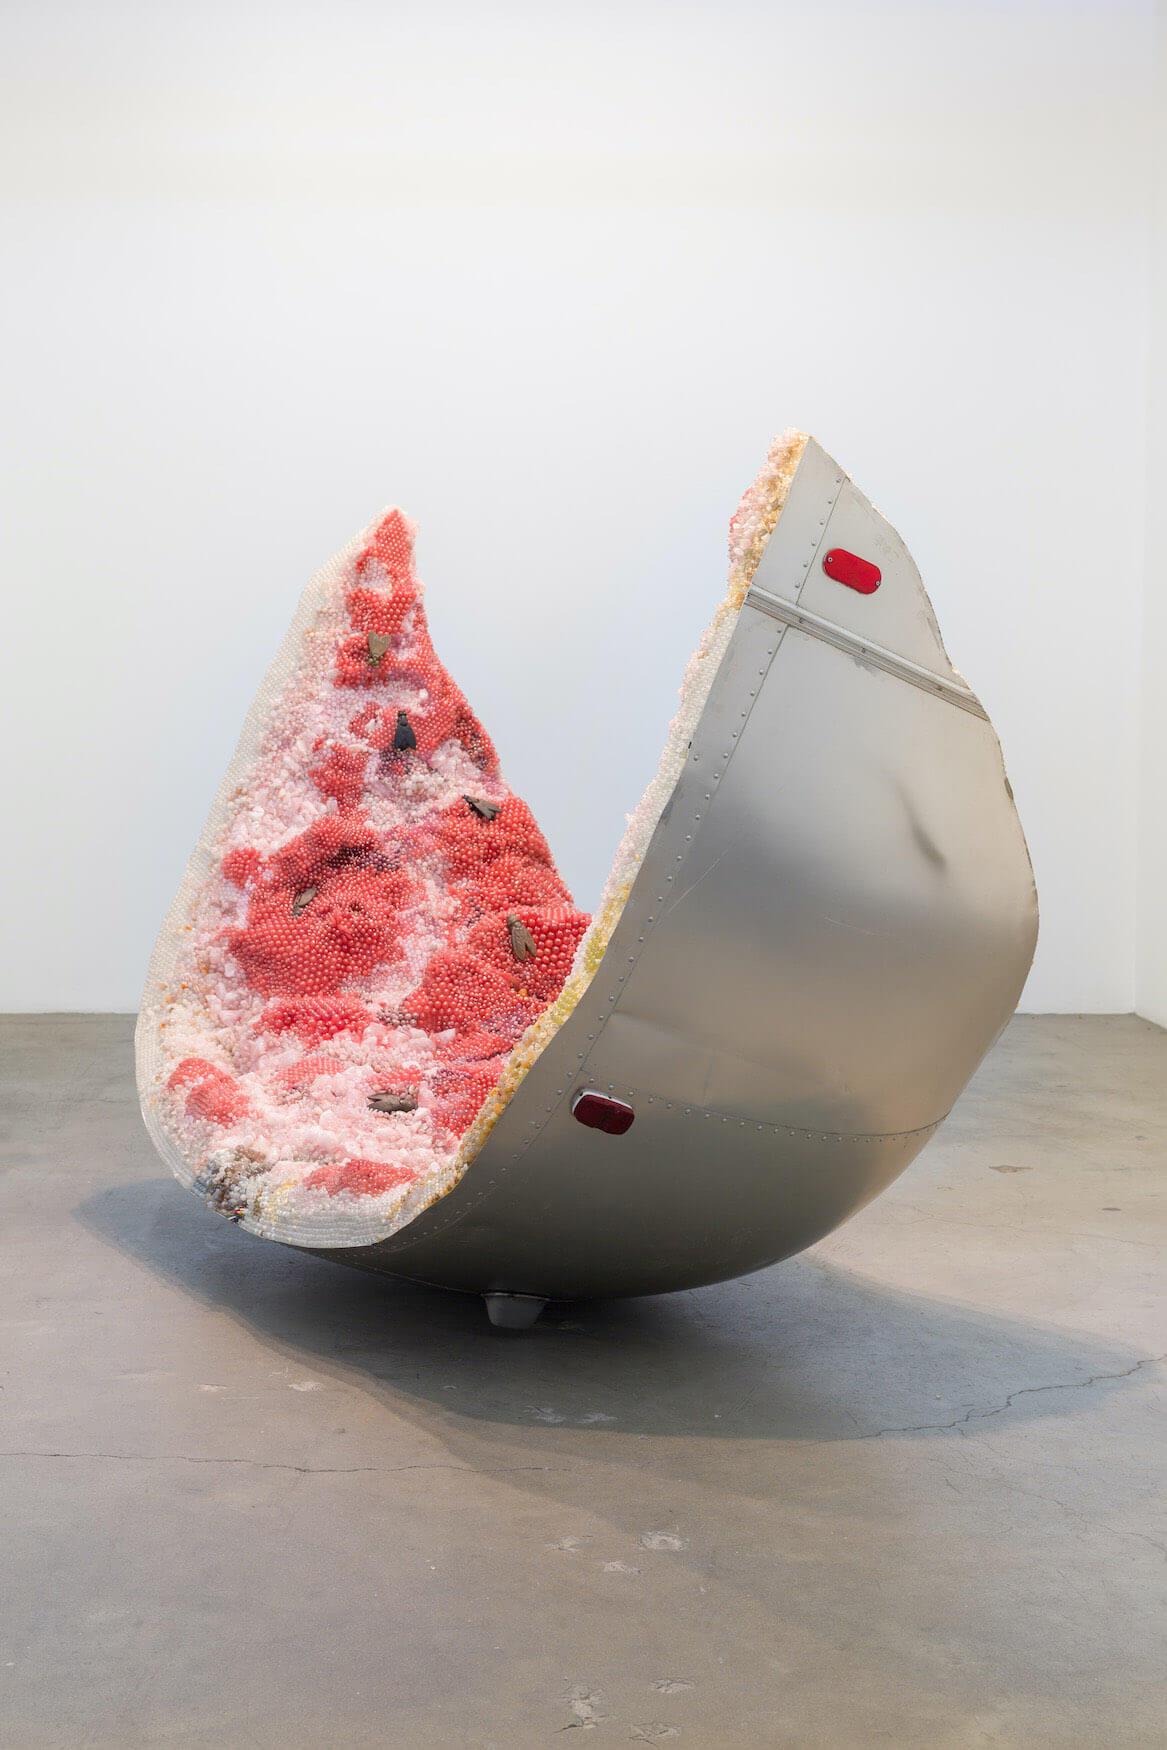 Ryan, Bad Melon, 2020 (KR 20.001) B